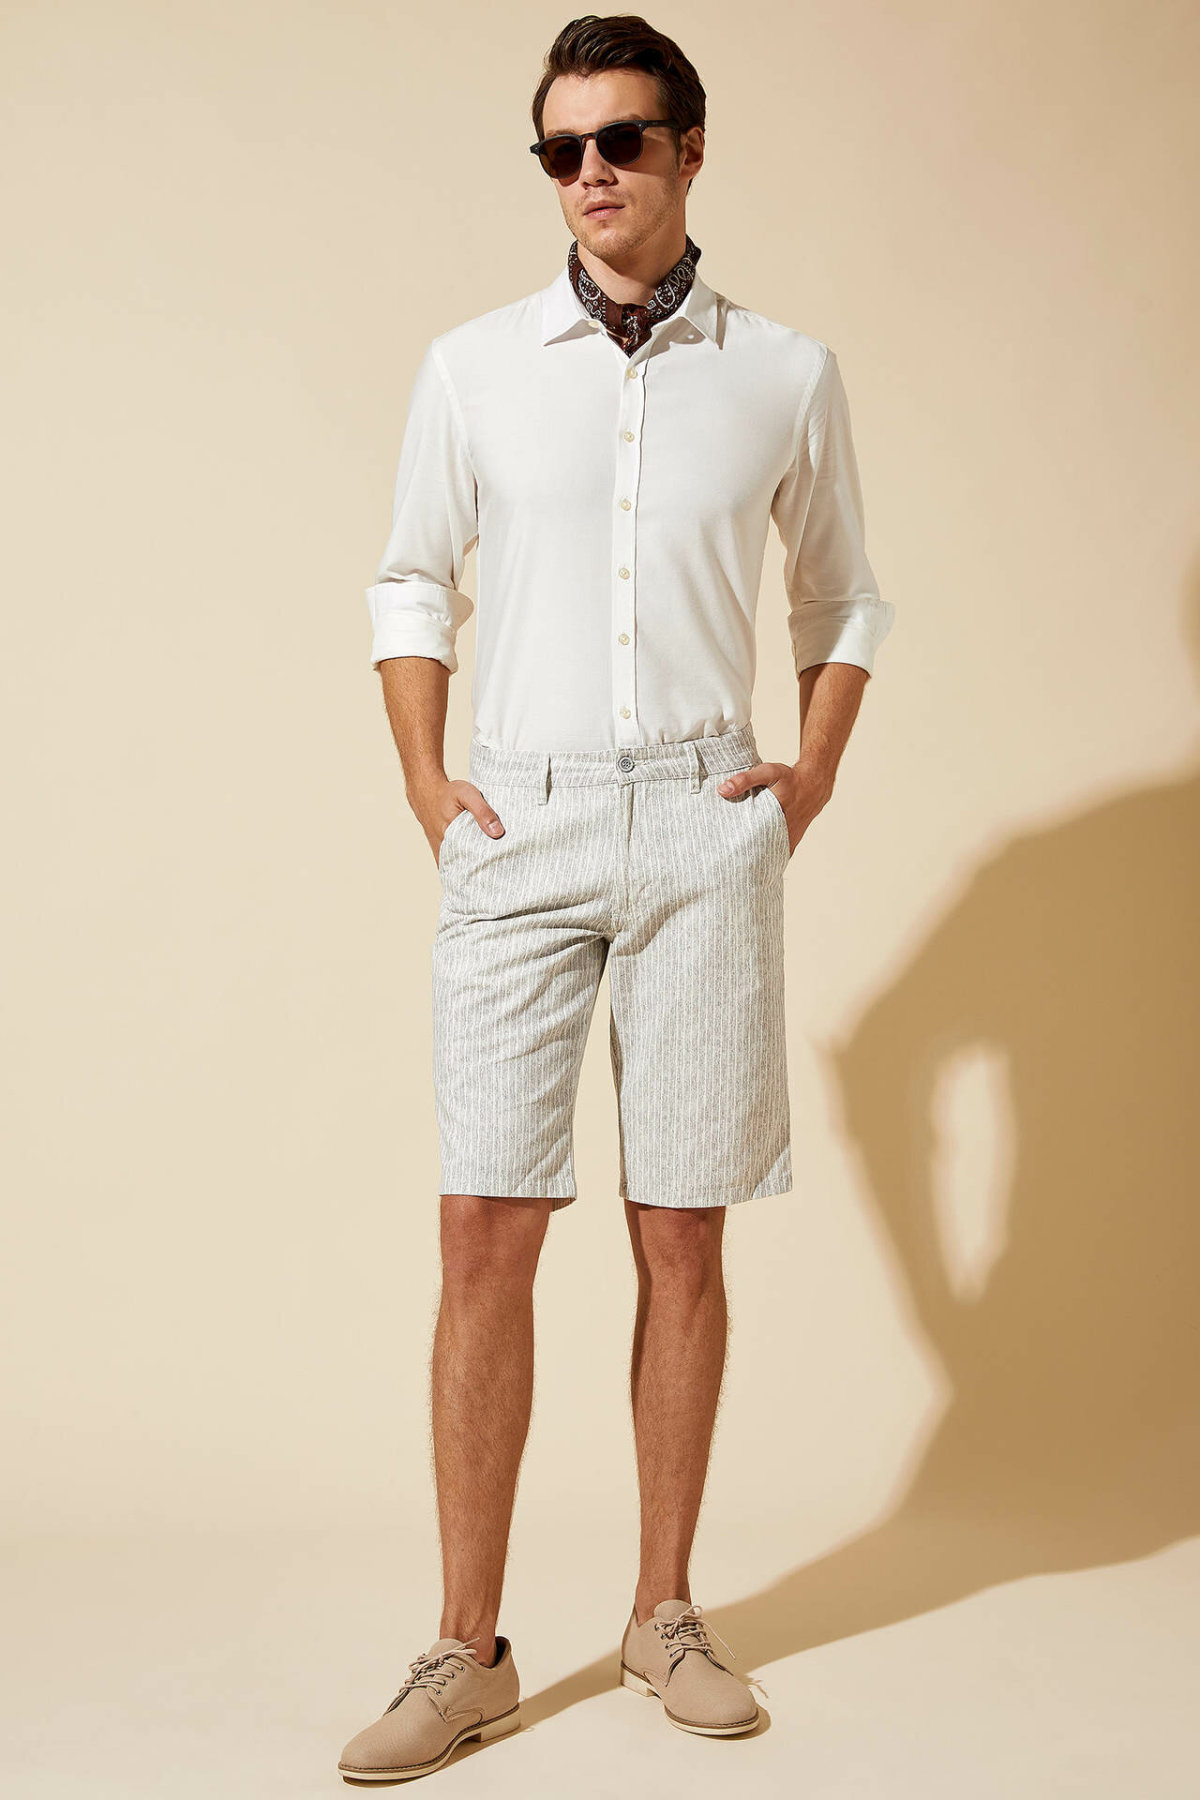 DeFacto Man Summer Light Color Casual Shorts Men Straight Bottom Shorts Male Mid-waist Bermuda-L6044AZ19SM